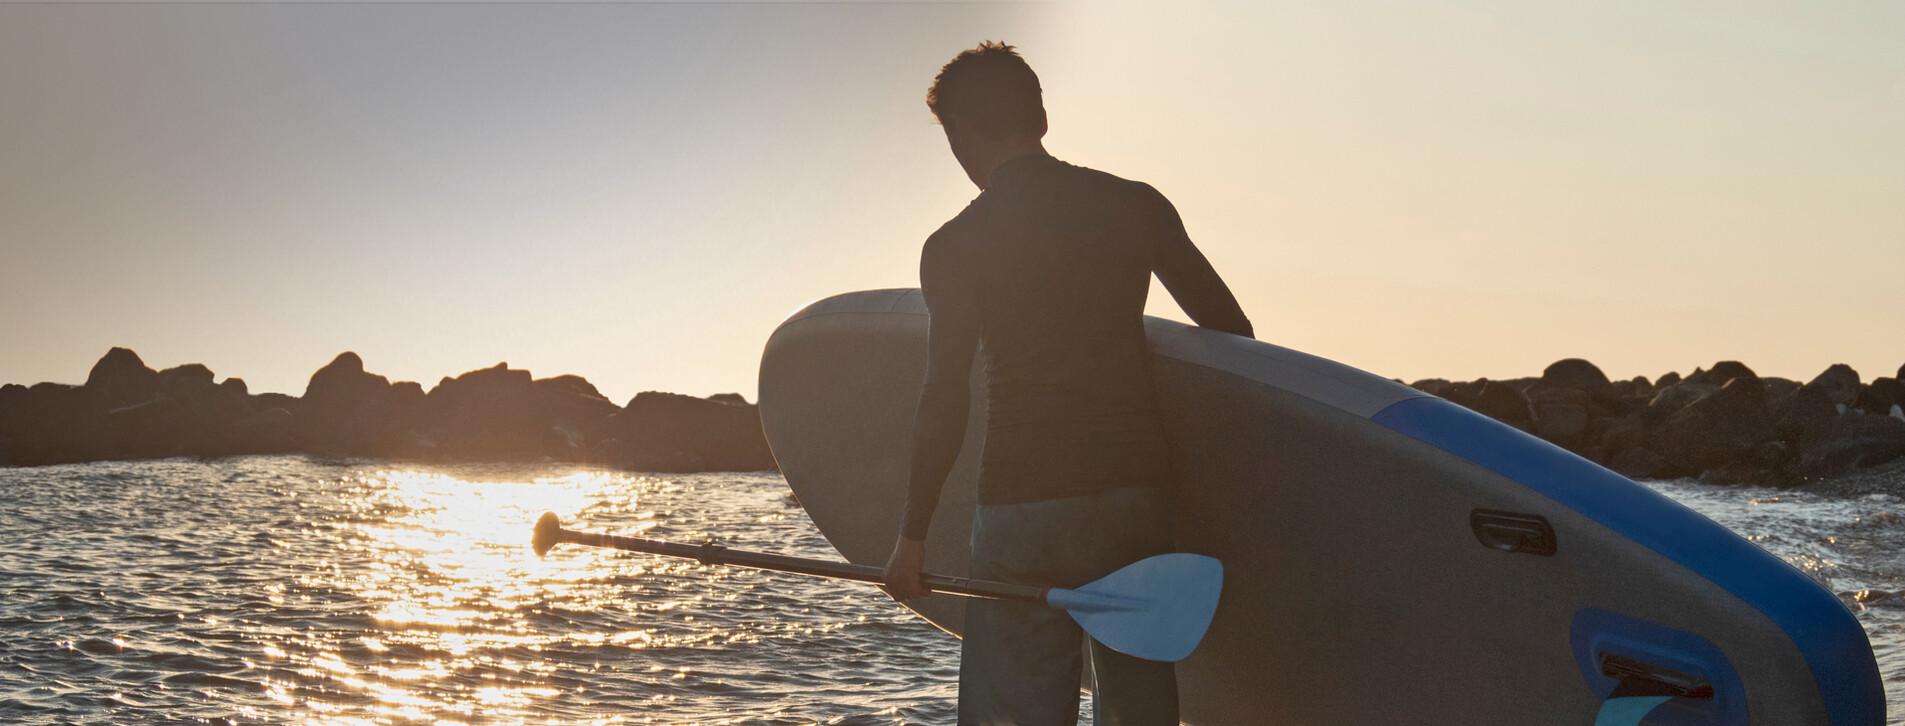 Фото 1 - SUP-серфинг на закате